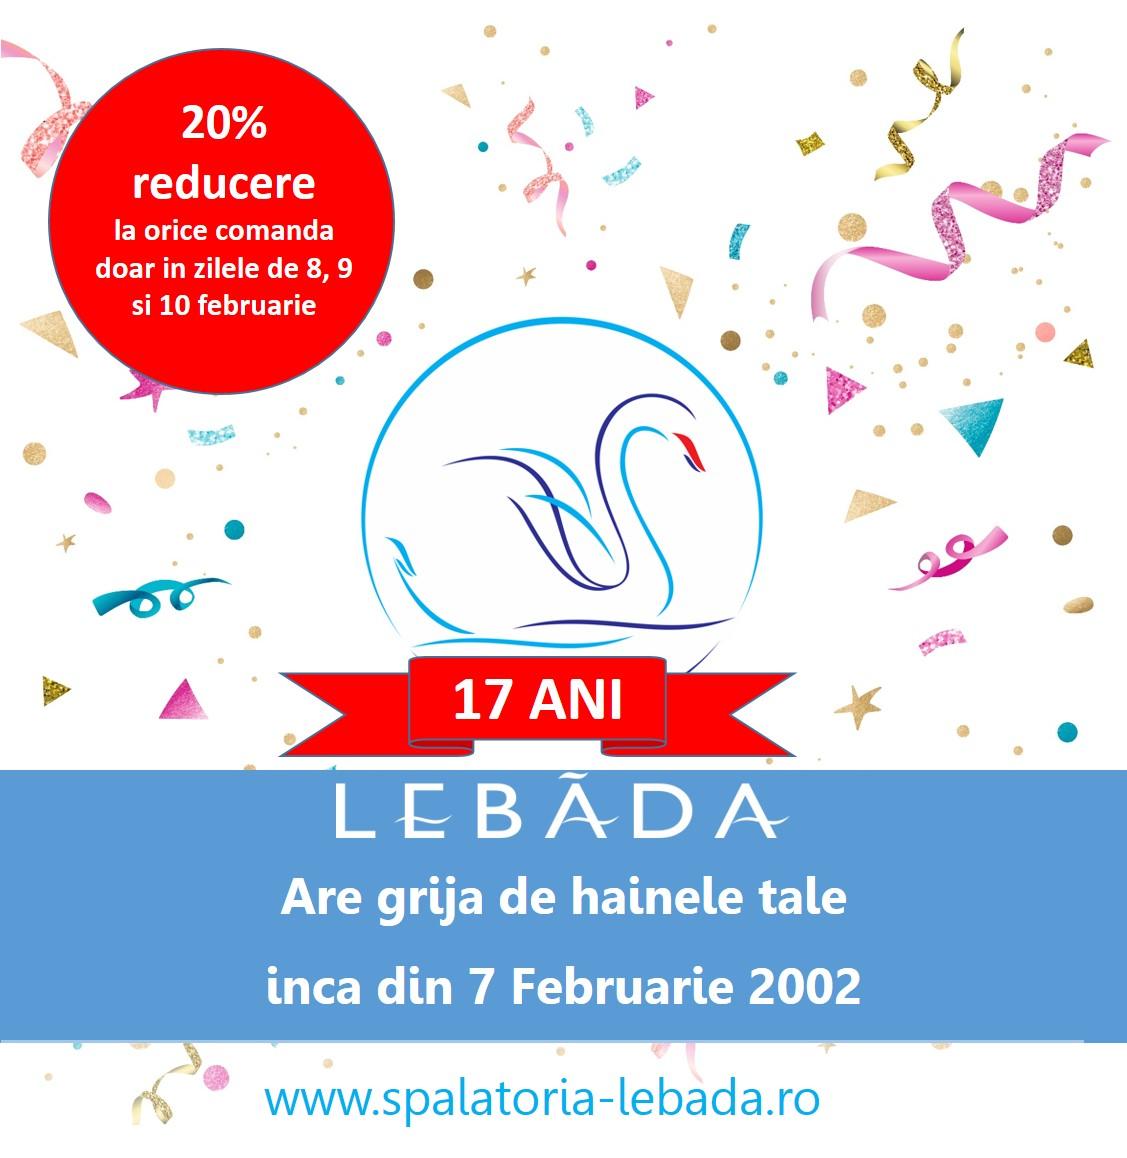 LEBADA 17 ANI